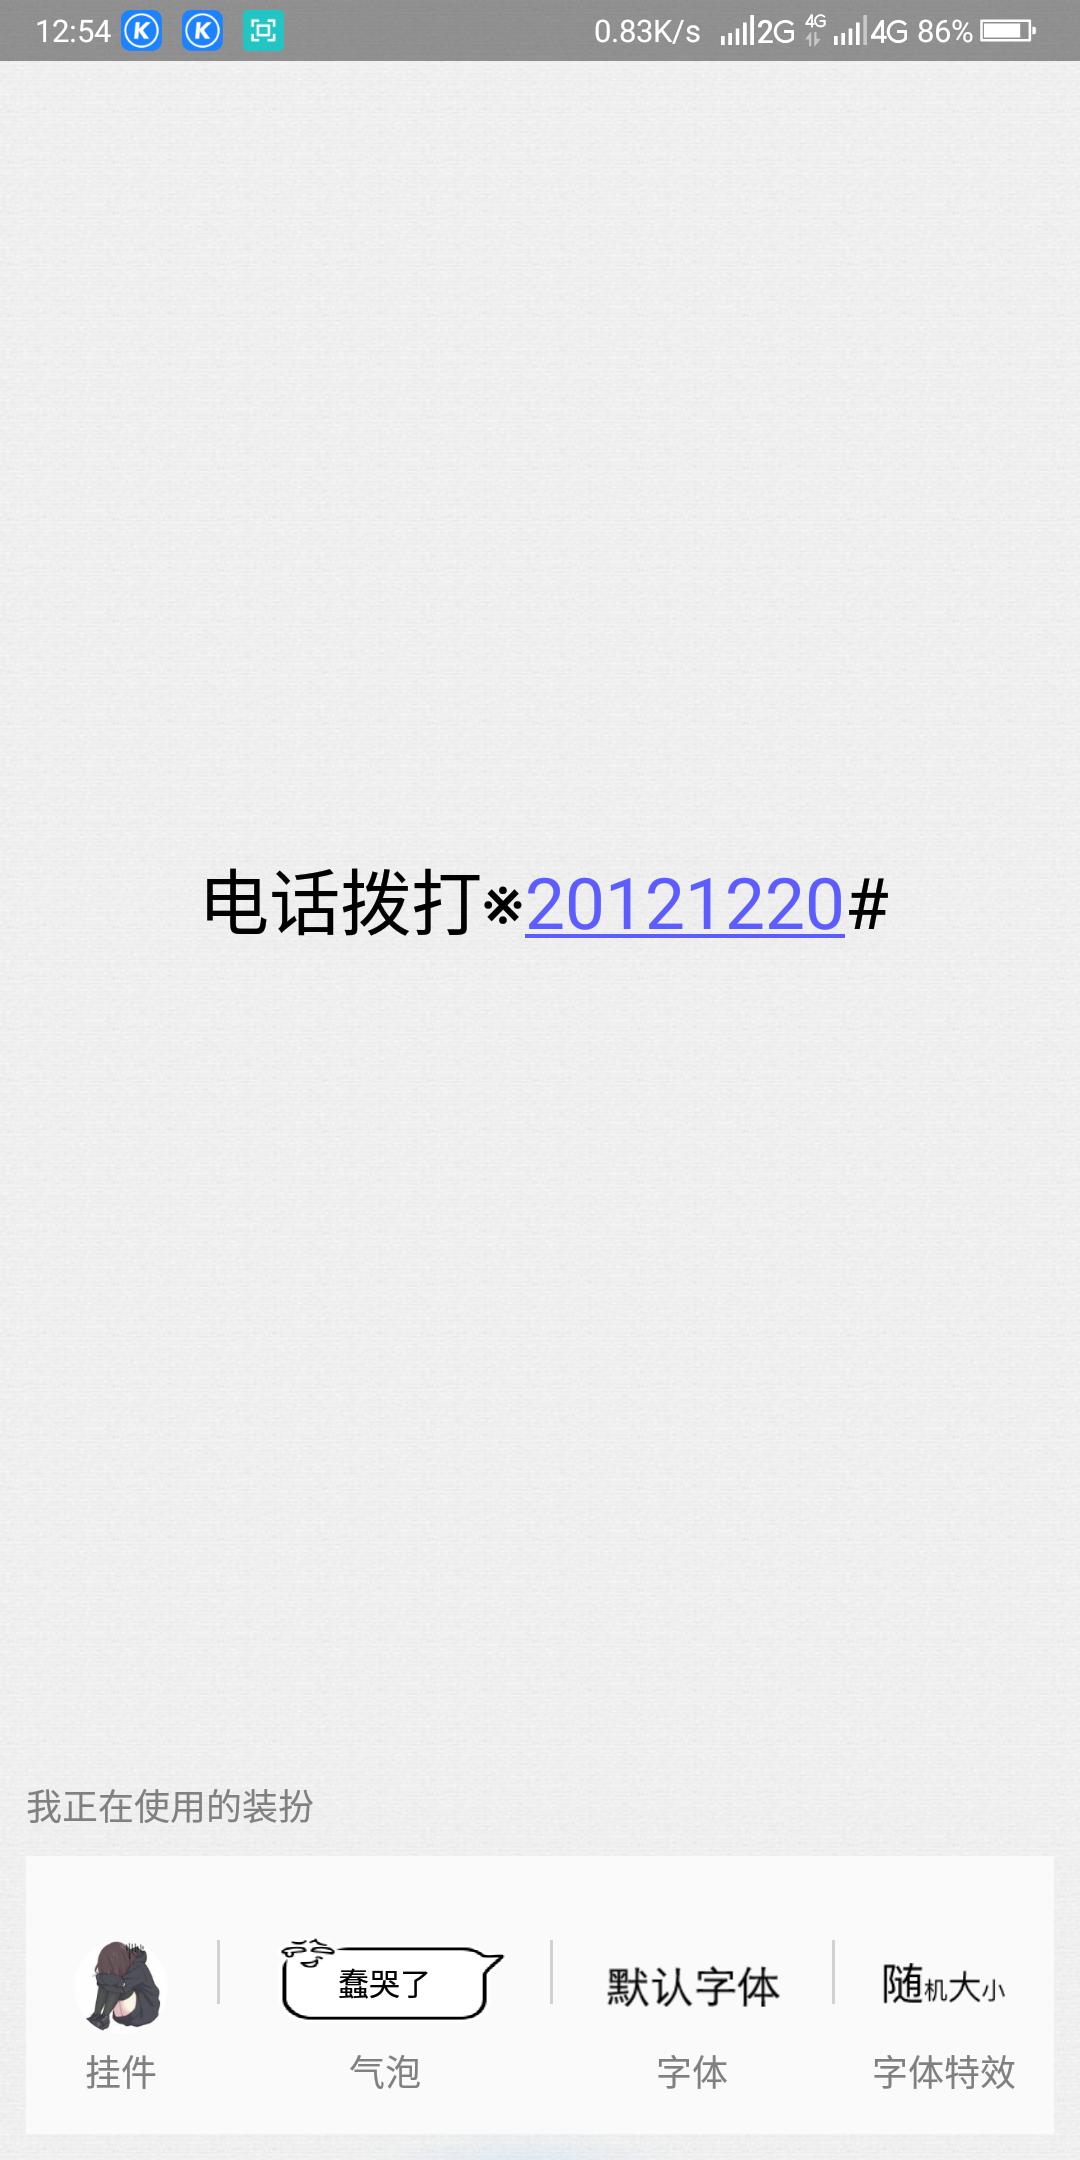 Screenshot_2018-06-19-12-54-08.png